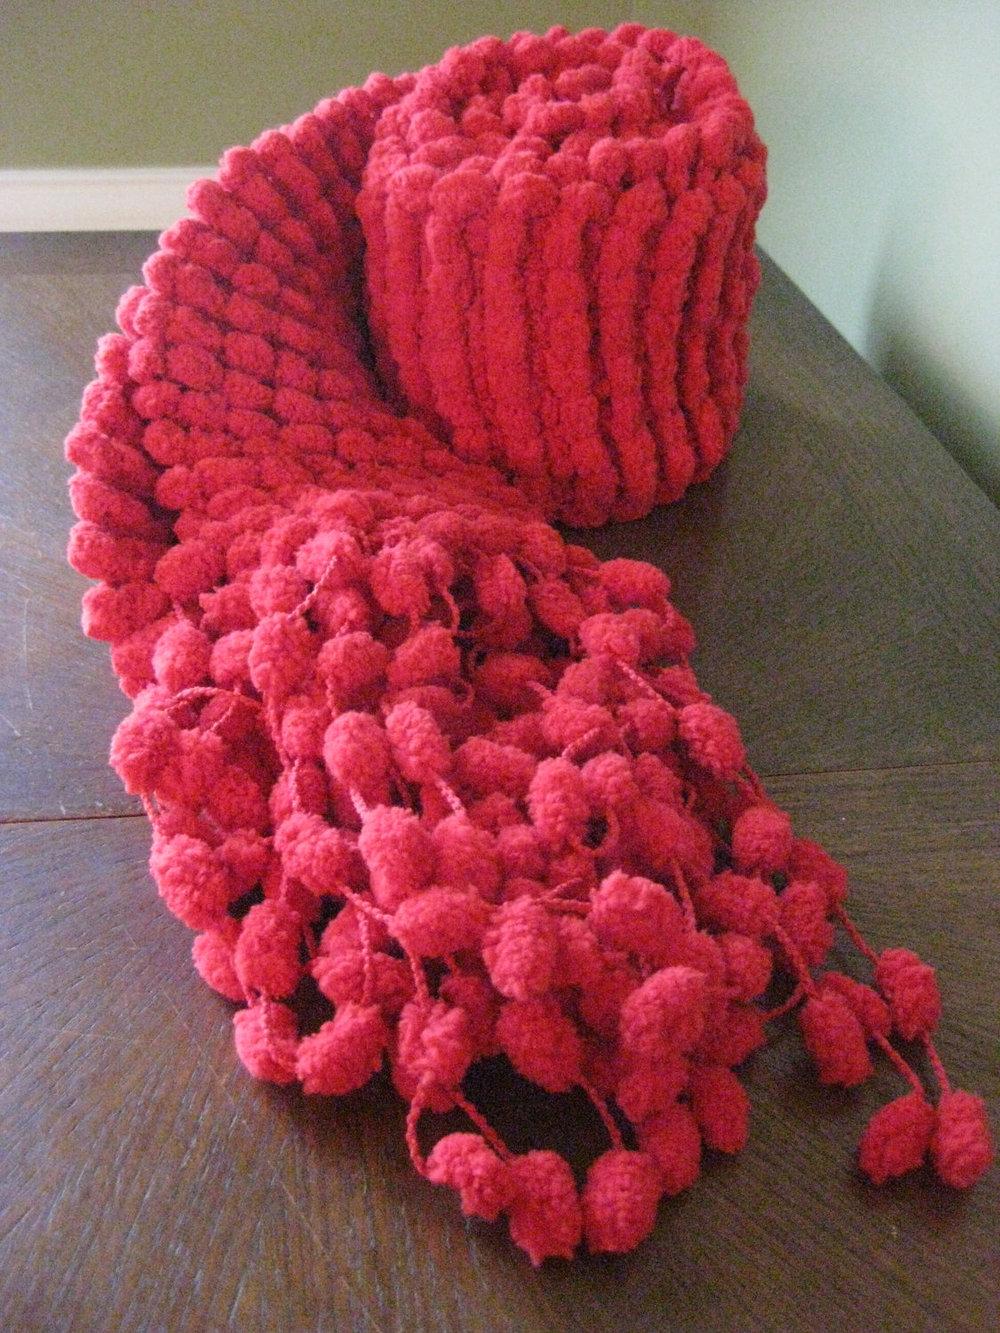 Fashion Pom Pom Yarn Ping Pong Yarn For Rug - Buy Pom Pom Rug,Pom ...